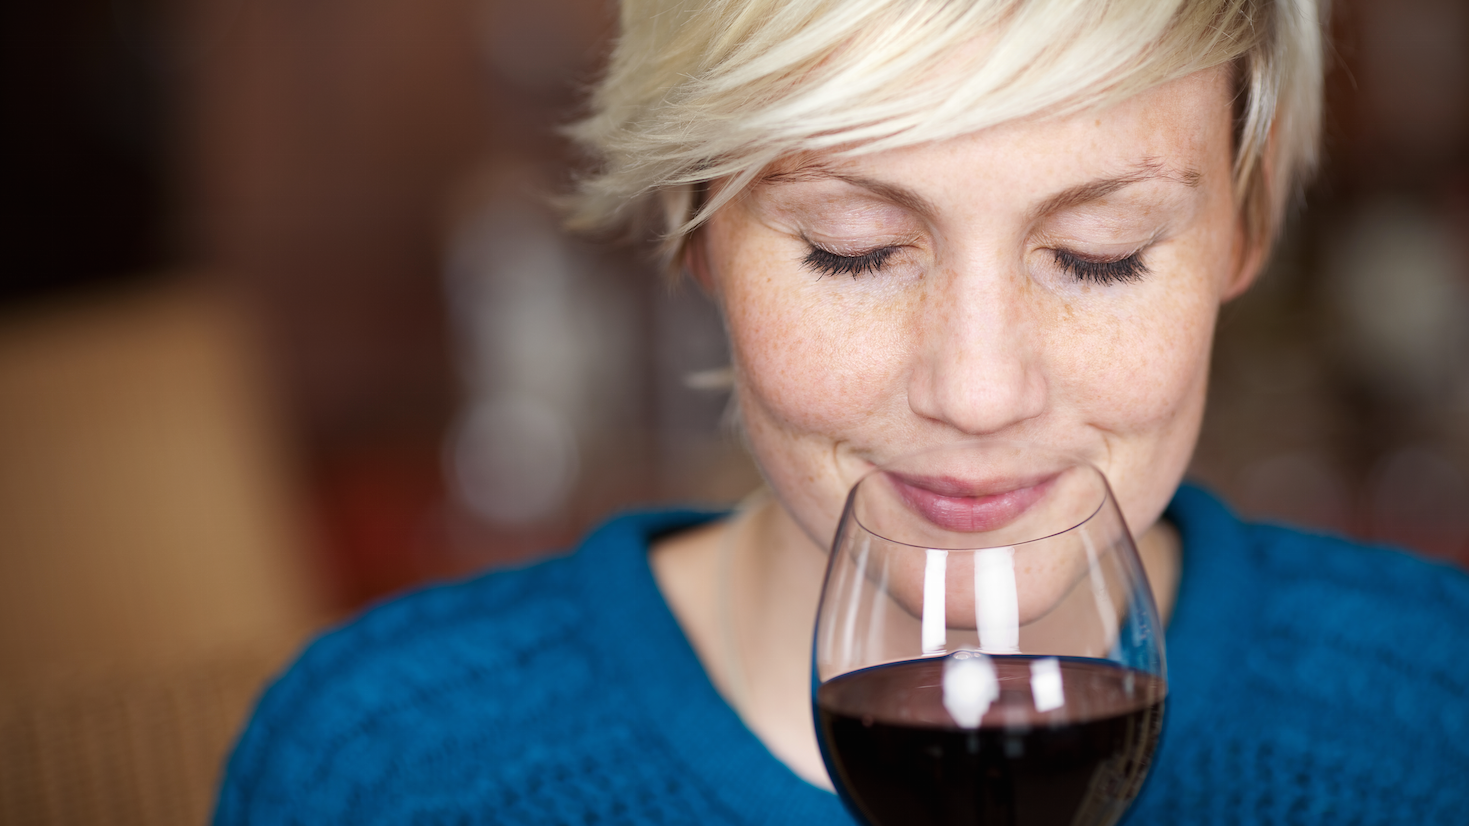 Wine Wednesday, Thursday, Friday